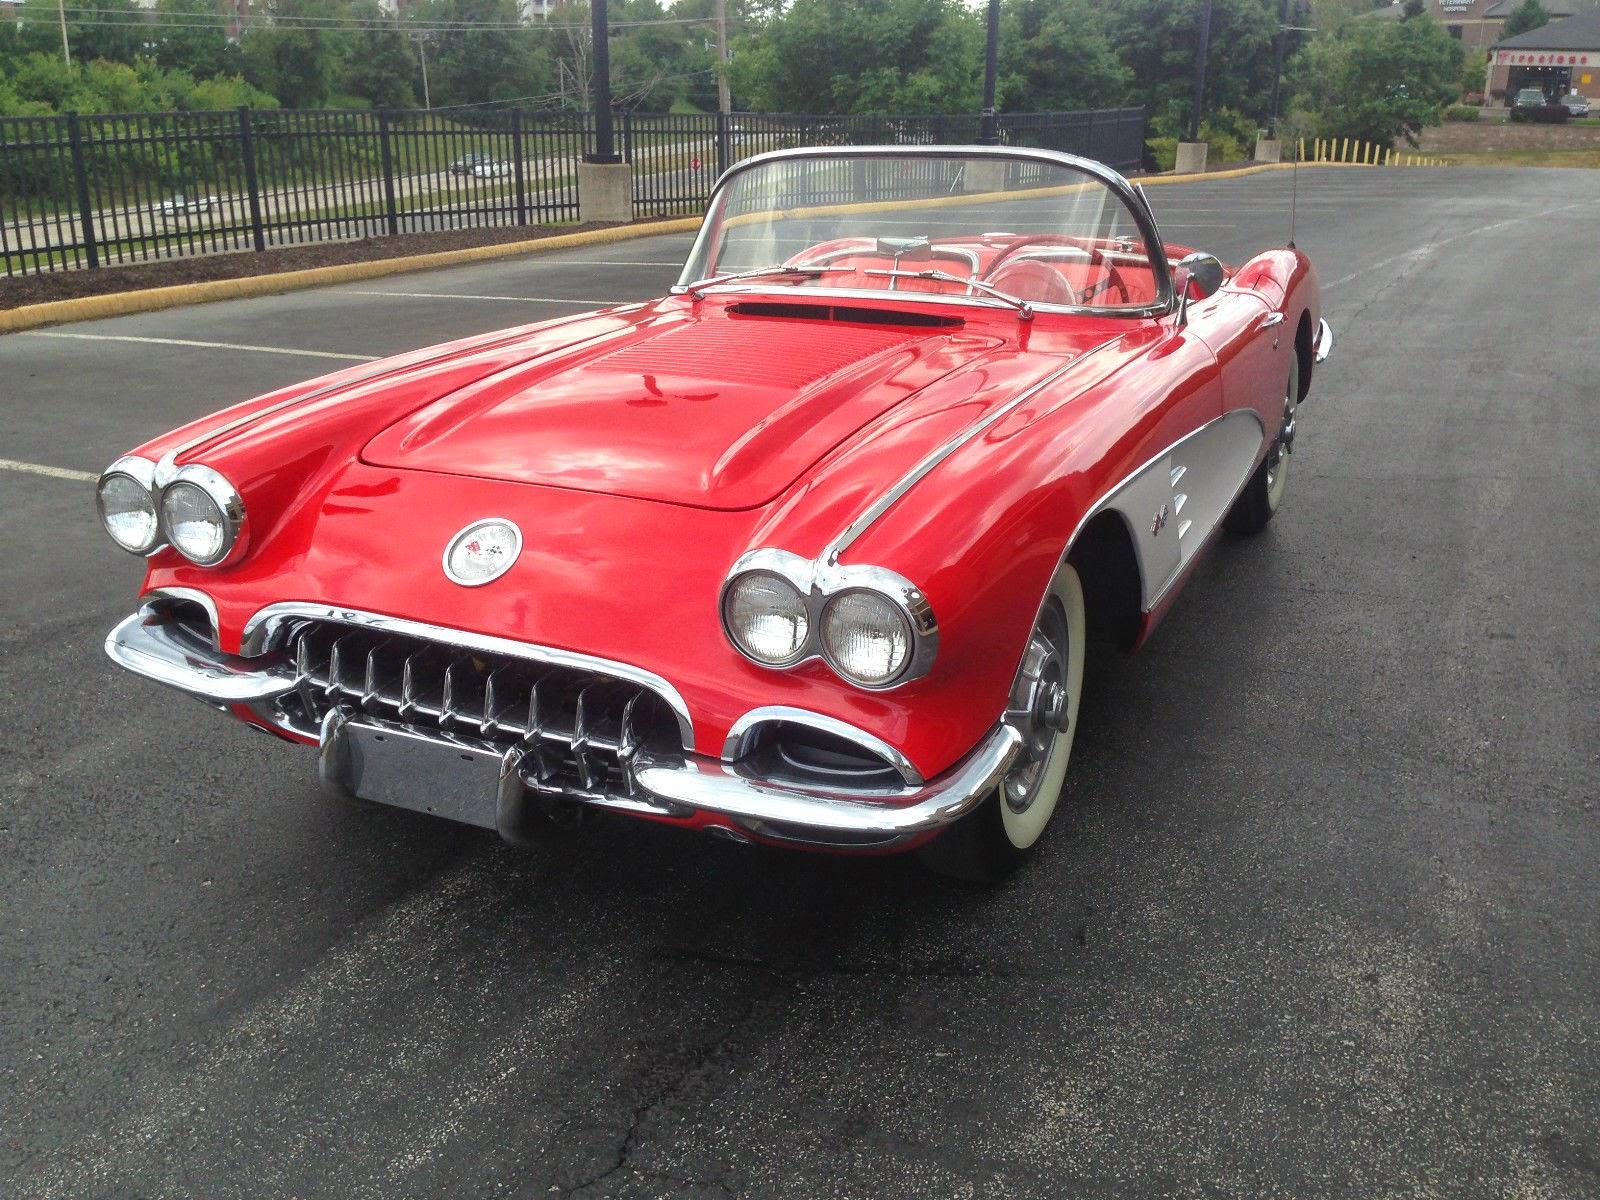 all american classic cars 1958 chevrolet corvette 2 door convertible. Black Bedroom Furniture Sets. Home Design Ideas